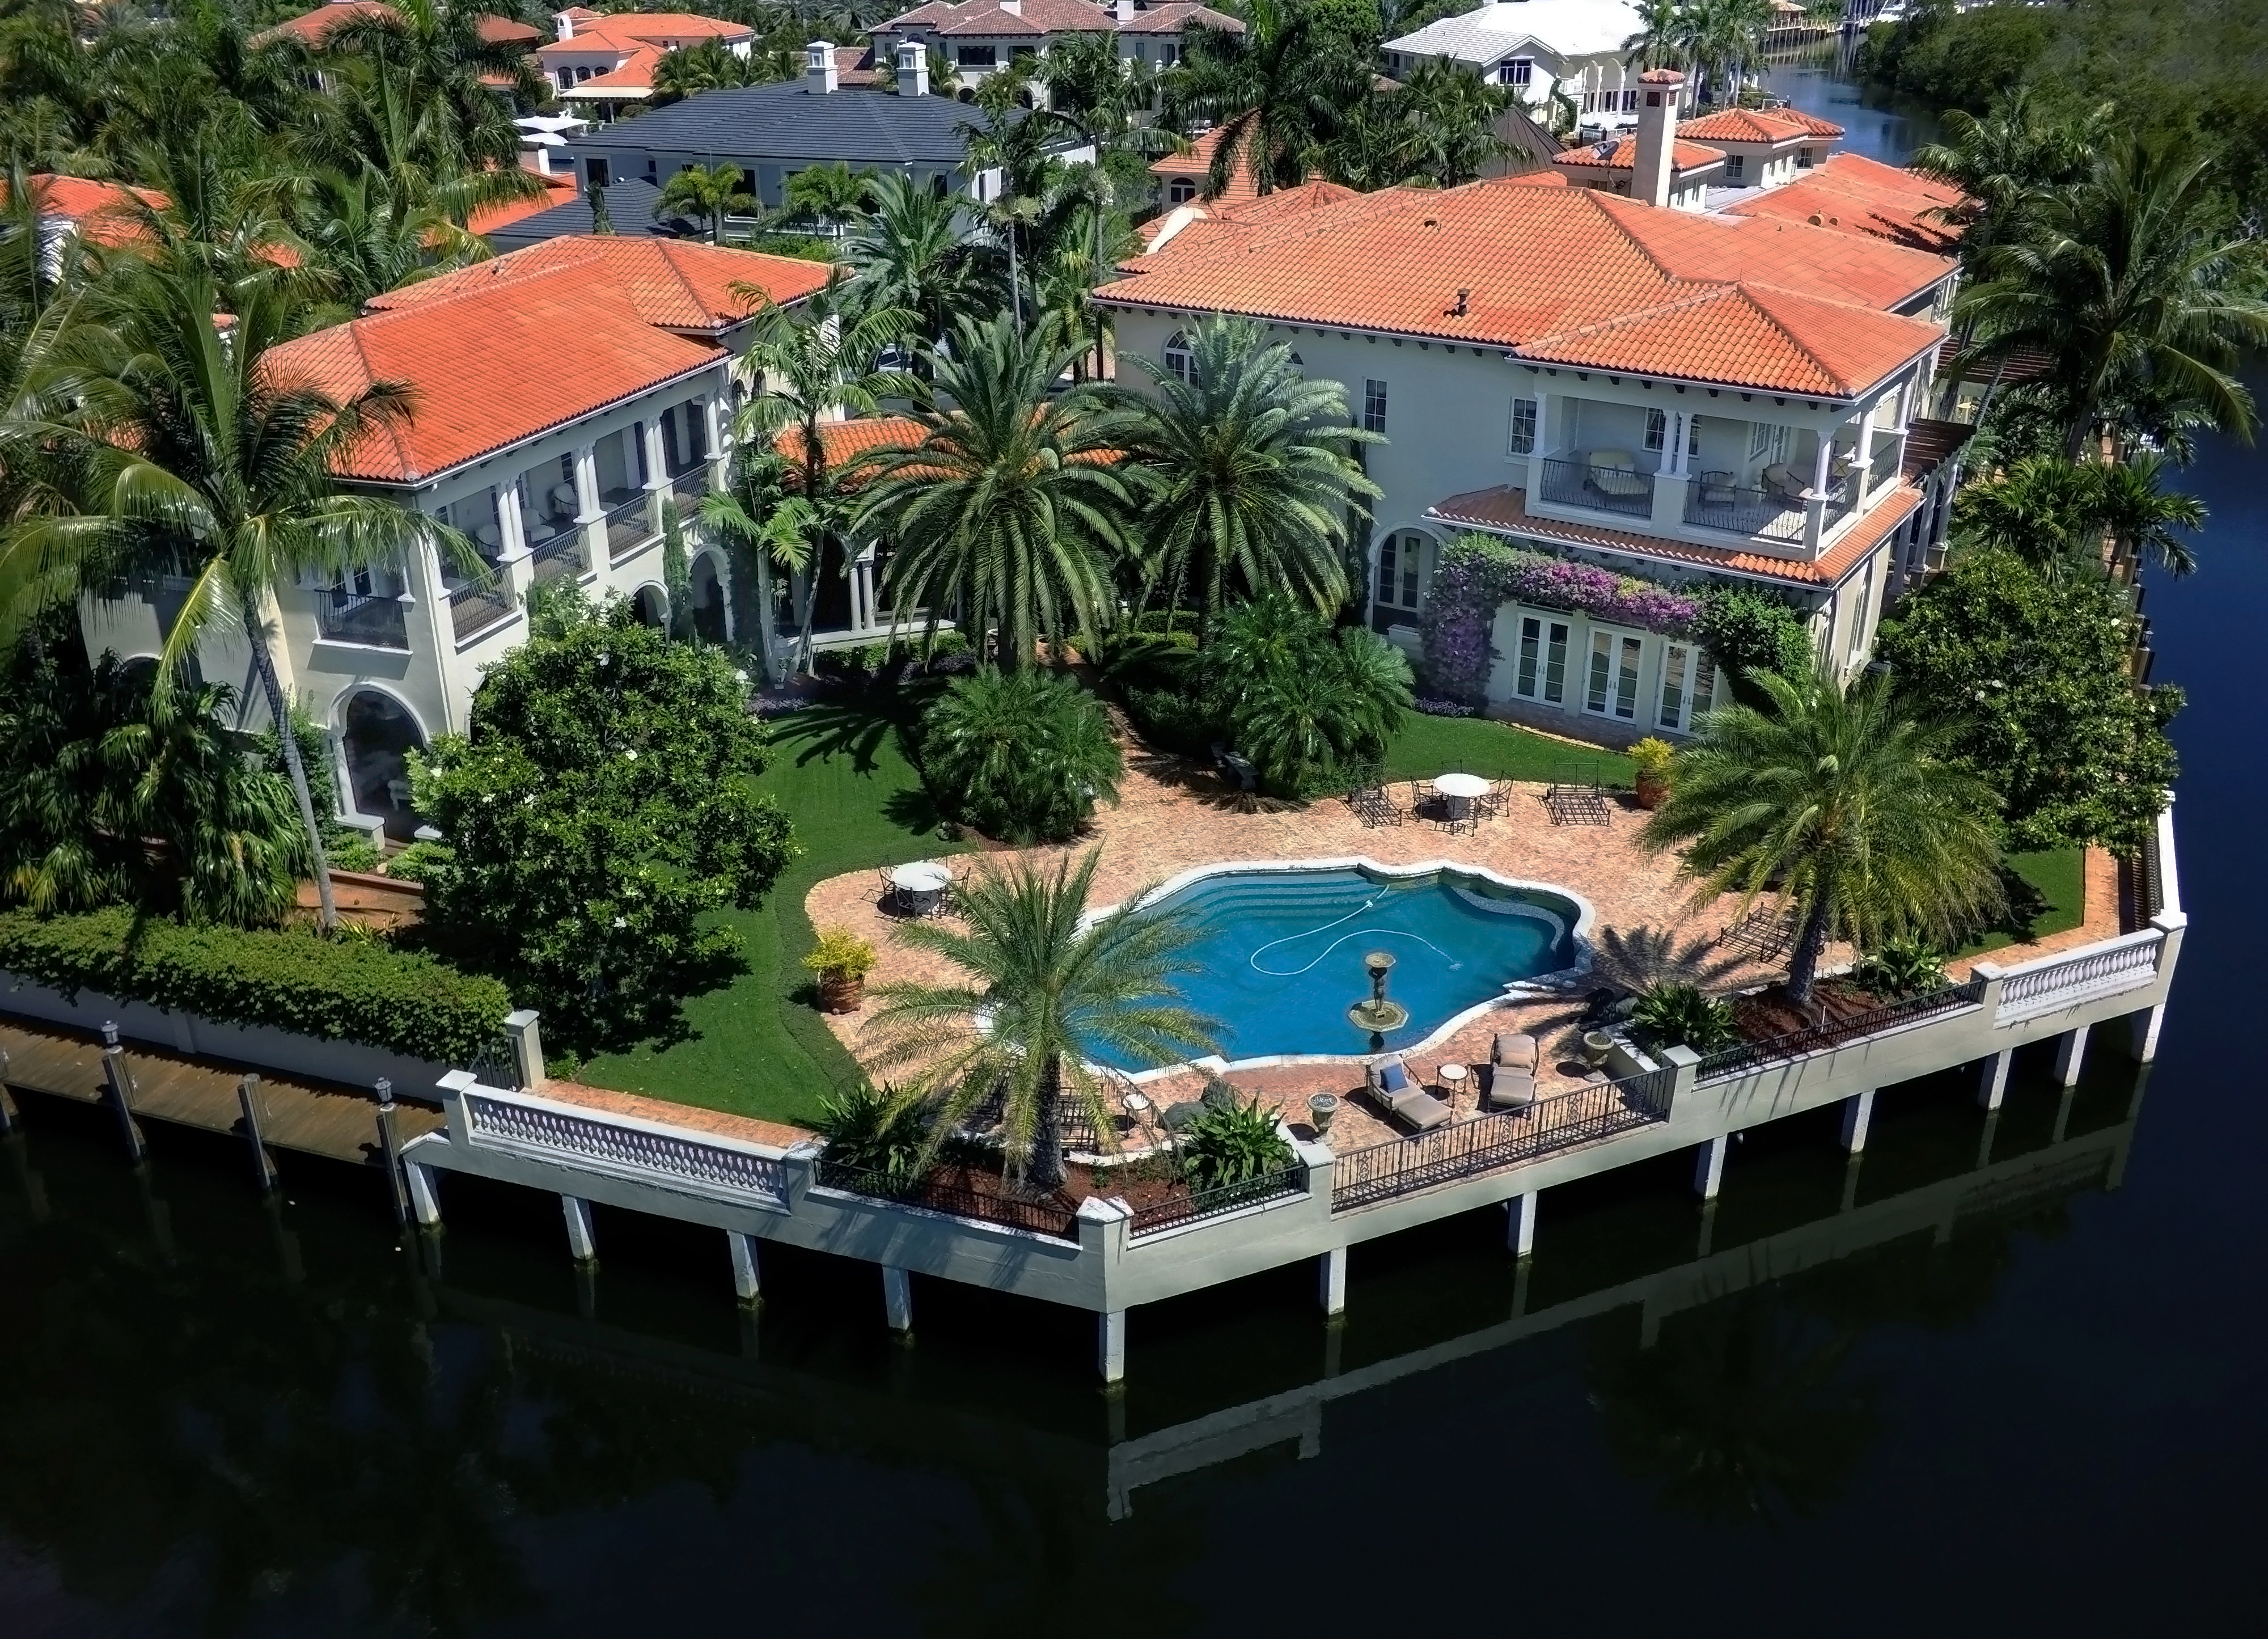 Boca Raton Watrerfront Luxury Real Estate_The Sanctuary Yachting Homes For Sale_799 Sanctuary Drive_Boca Raton Florida 33431